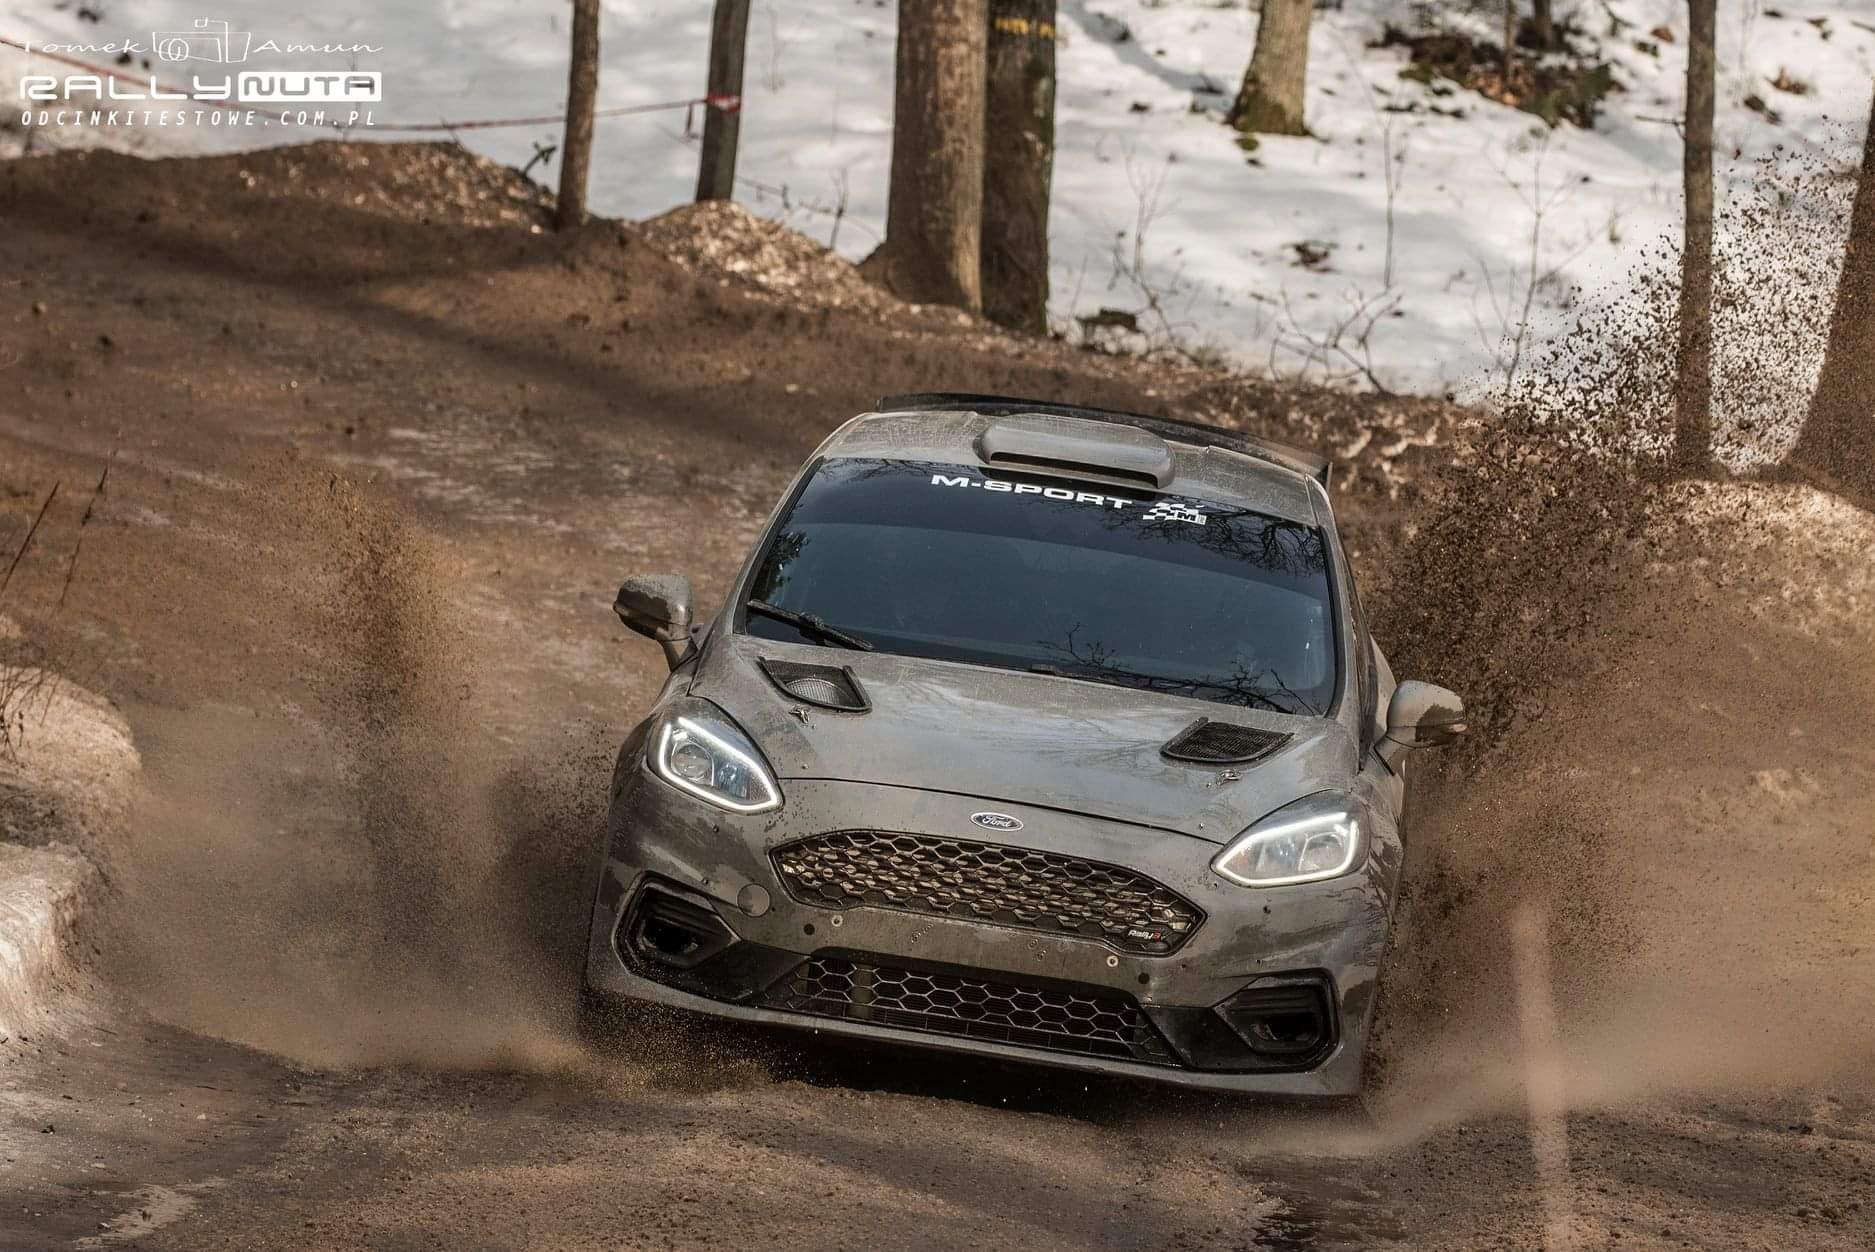 FIA European Rally Championship: Temporada 2021 - Página 3 EvBNduRWQAIxZil?format=jpg&name=large